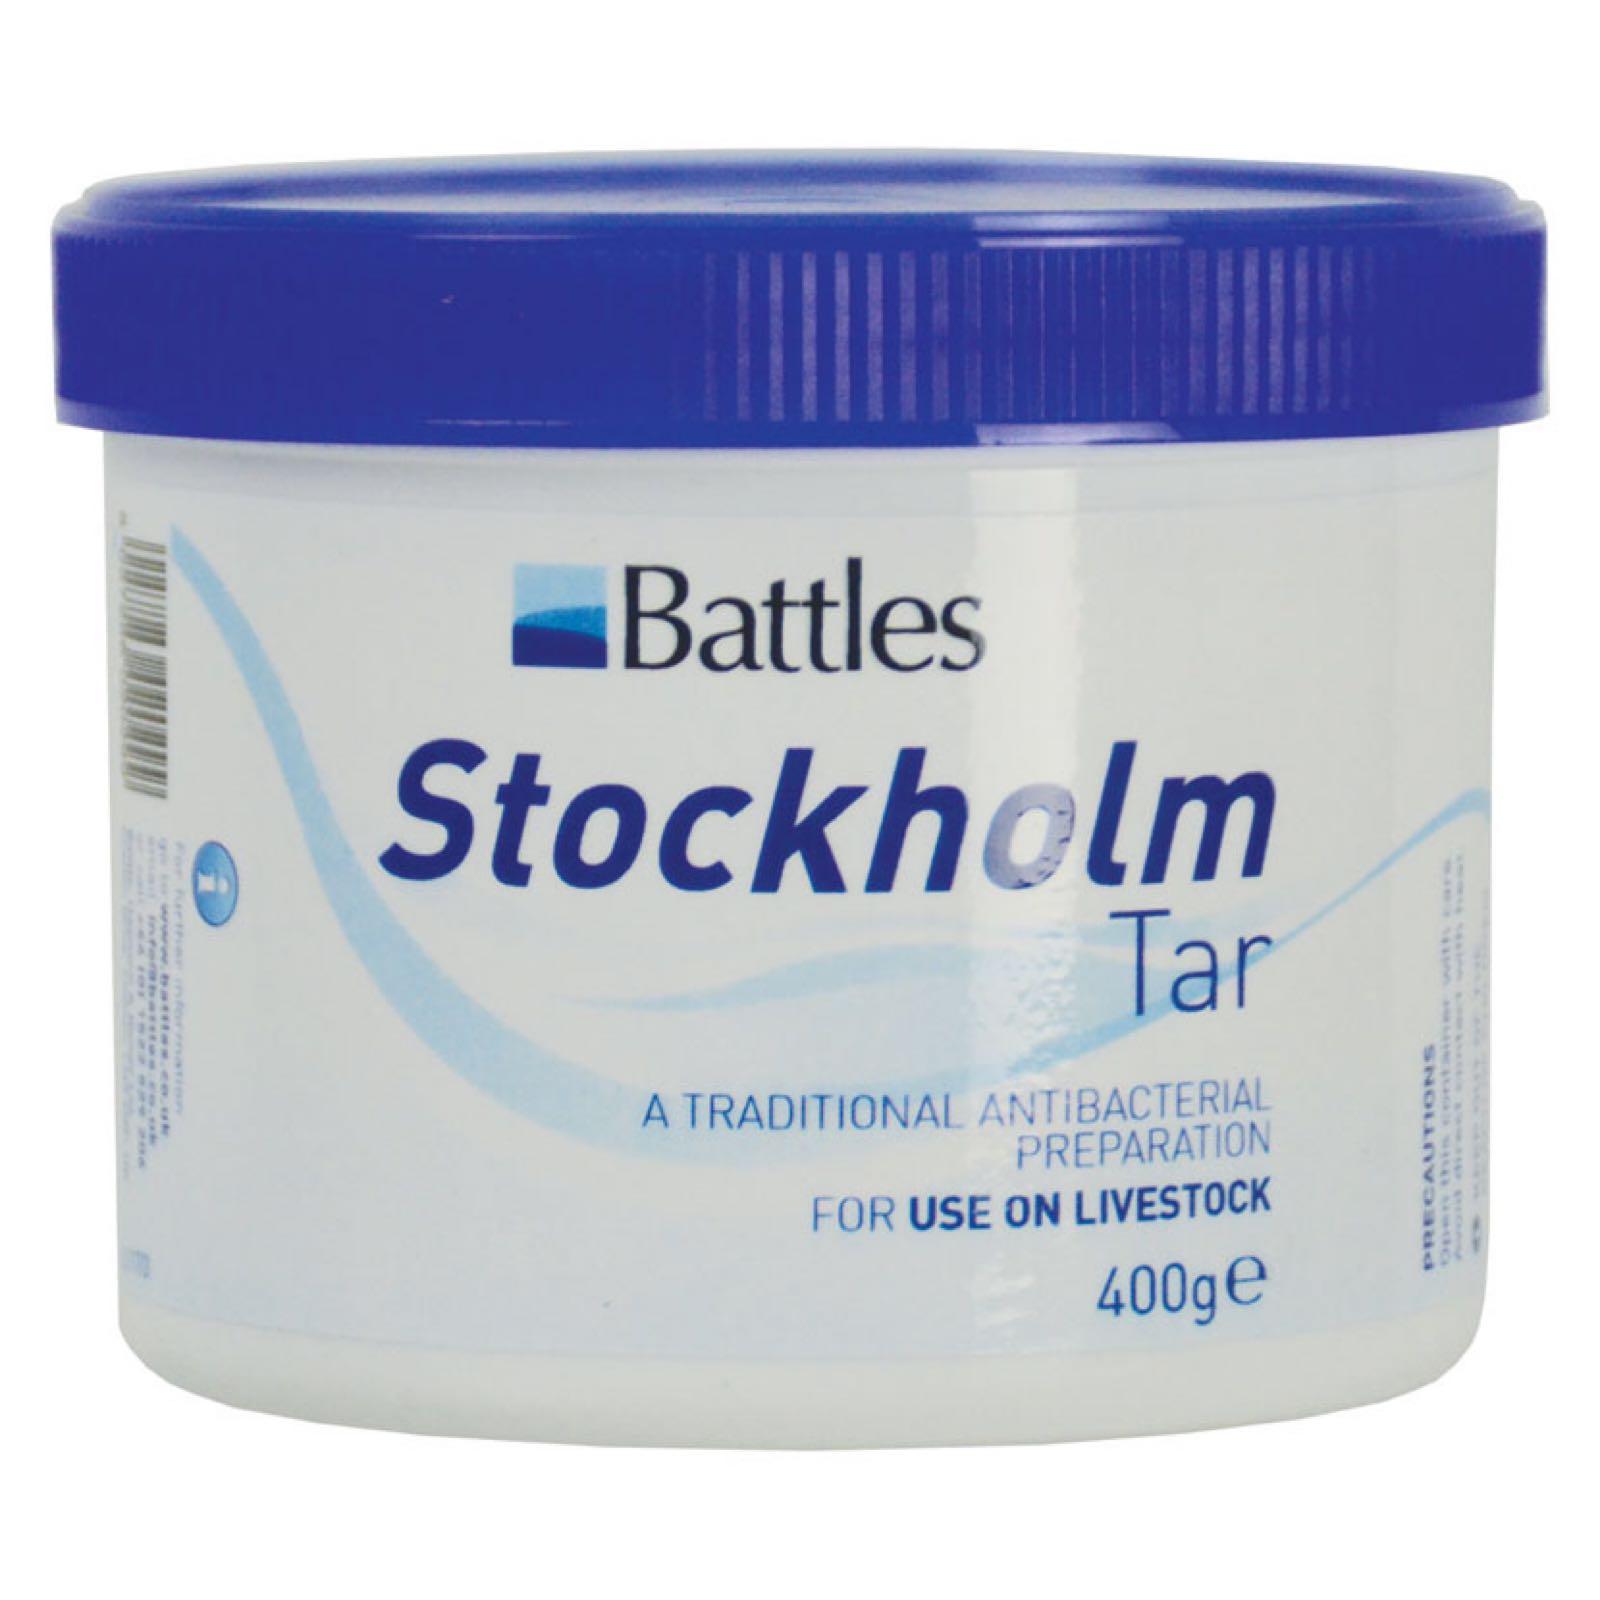 Battles Stockholm tar 400g